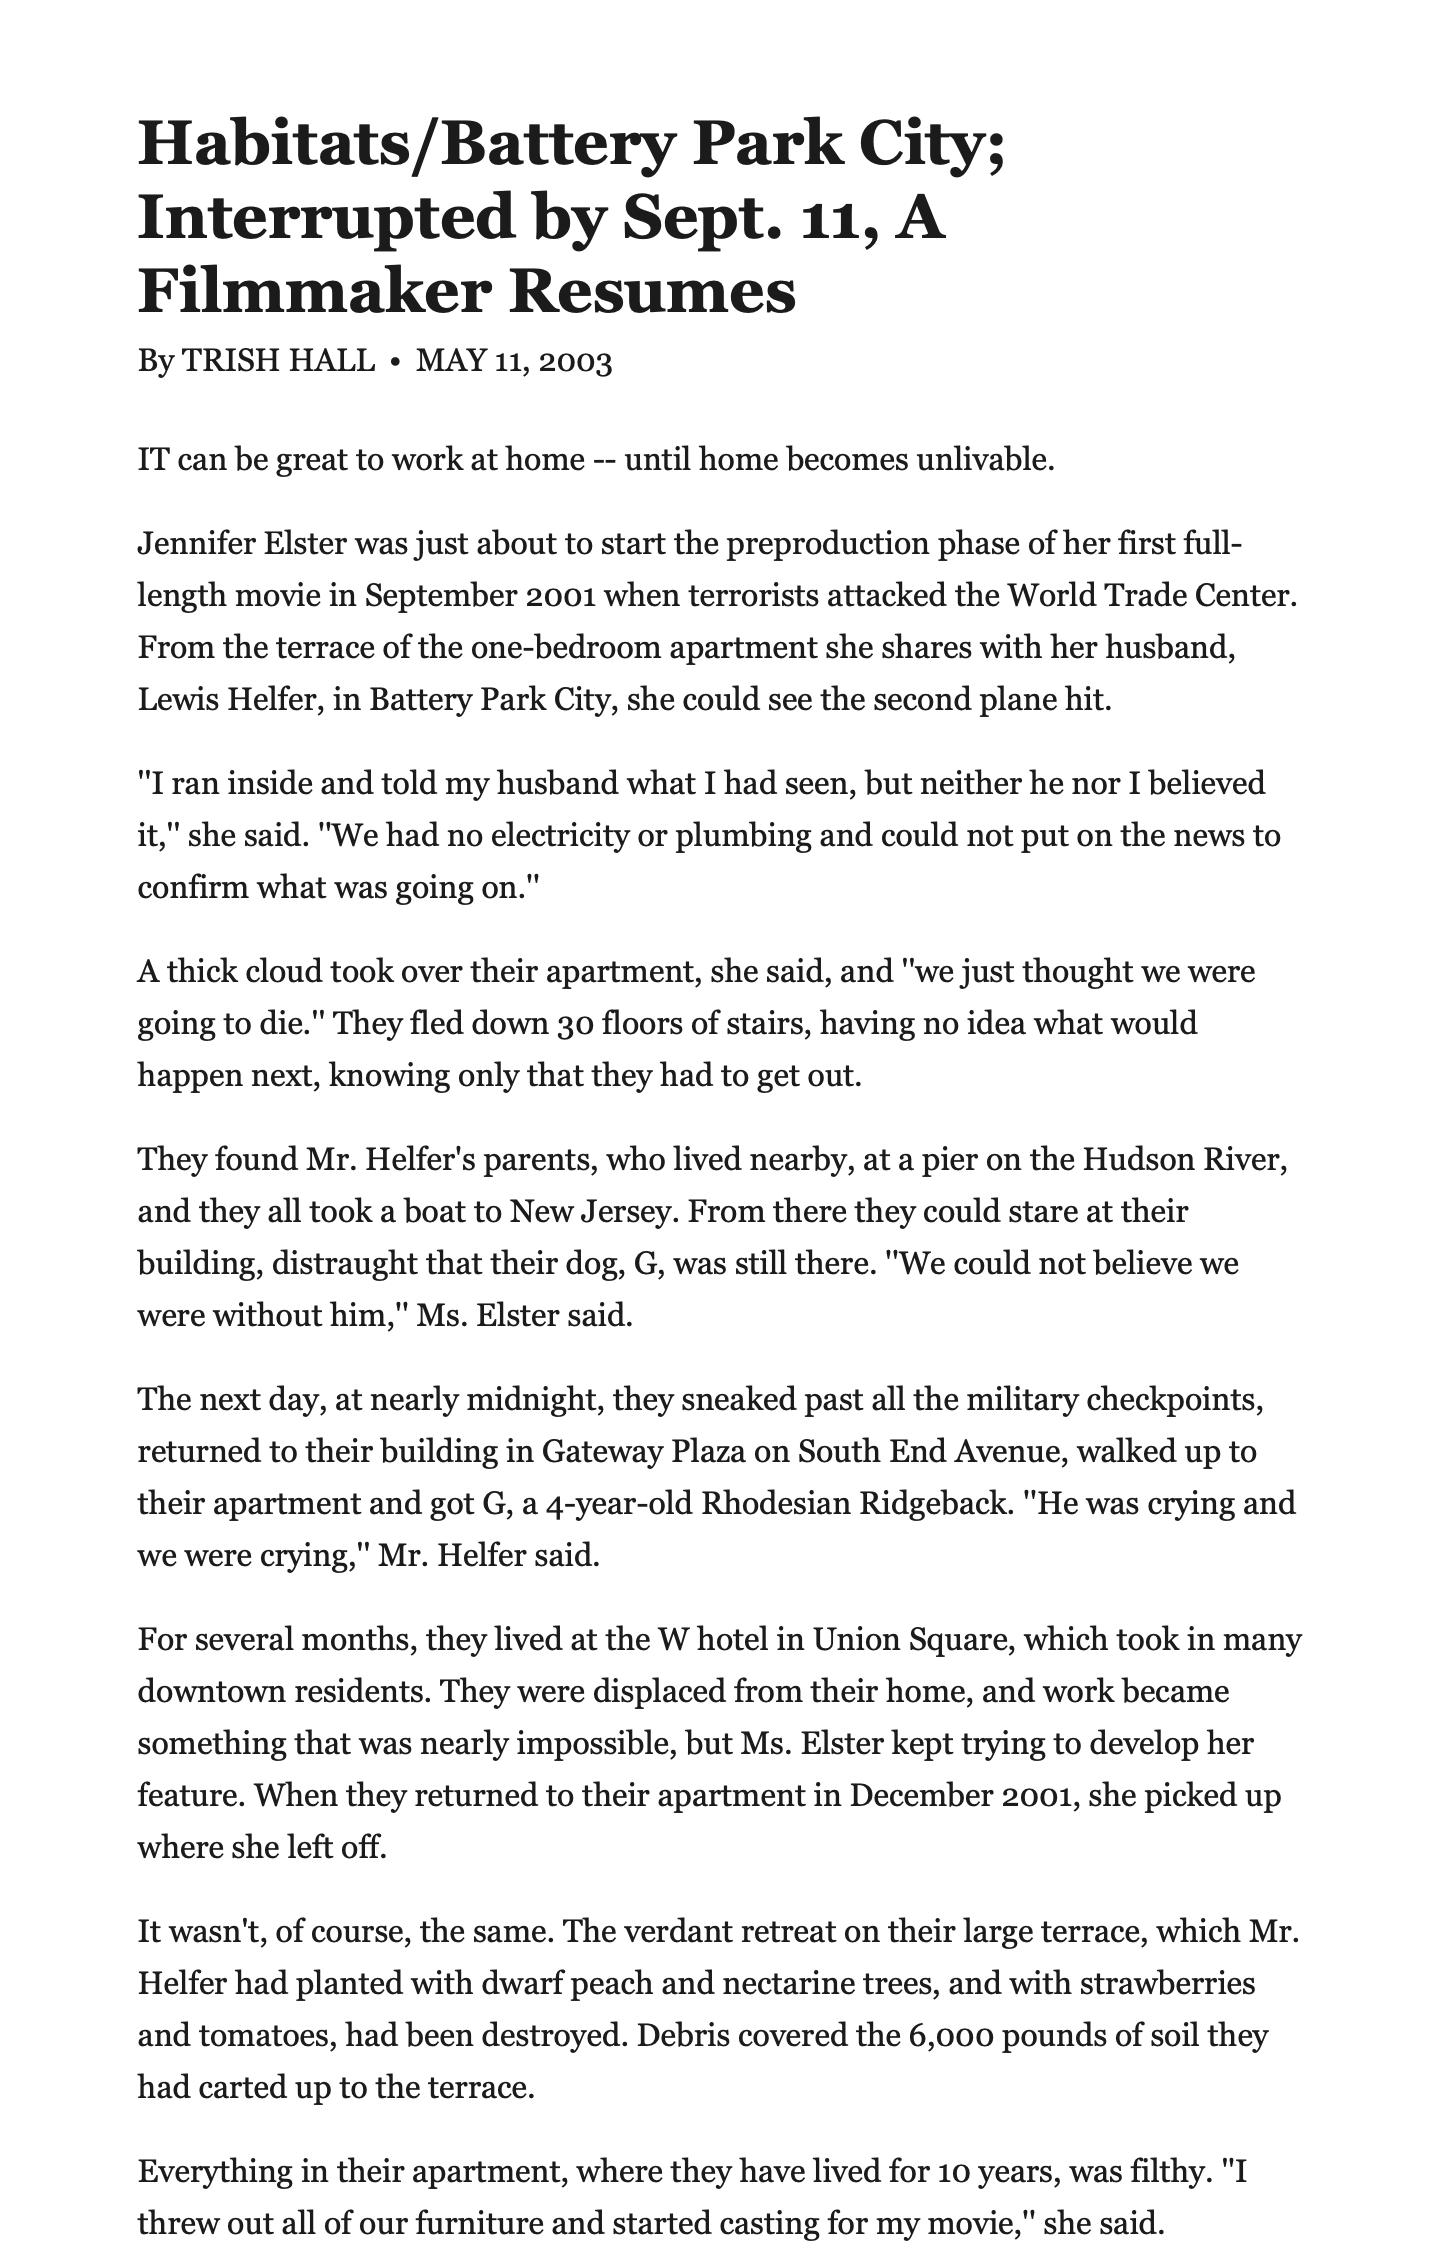 New-York-Times-Press-Jennifer-Elster-Habitats:Battery-Park-City-Interrupted-by-Sept.11-A-Filmmaker-Resumes_1.png